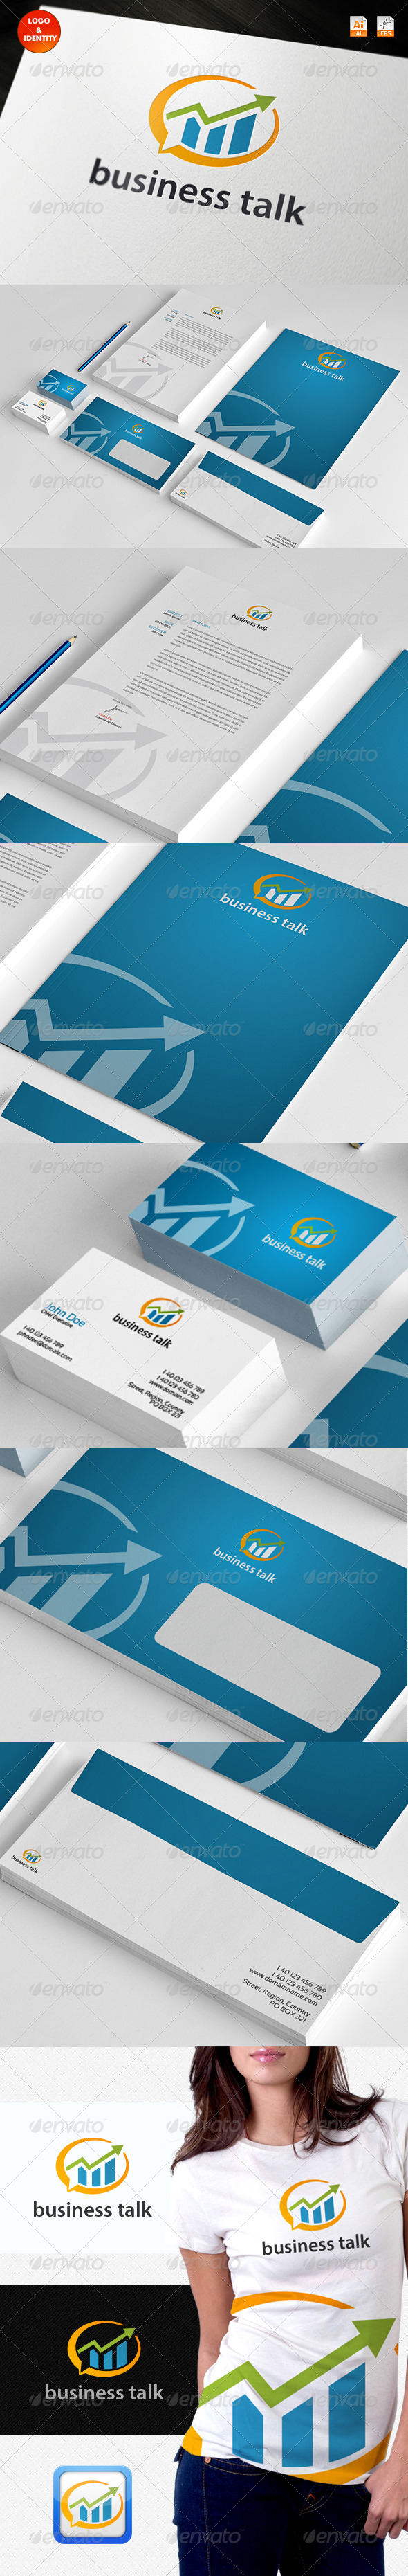 Business Talk Logo & Identity - Stationery Print Templates